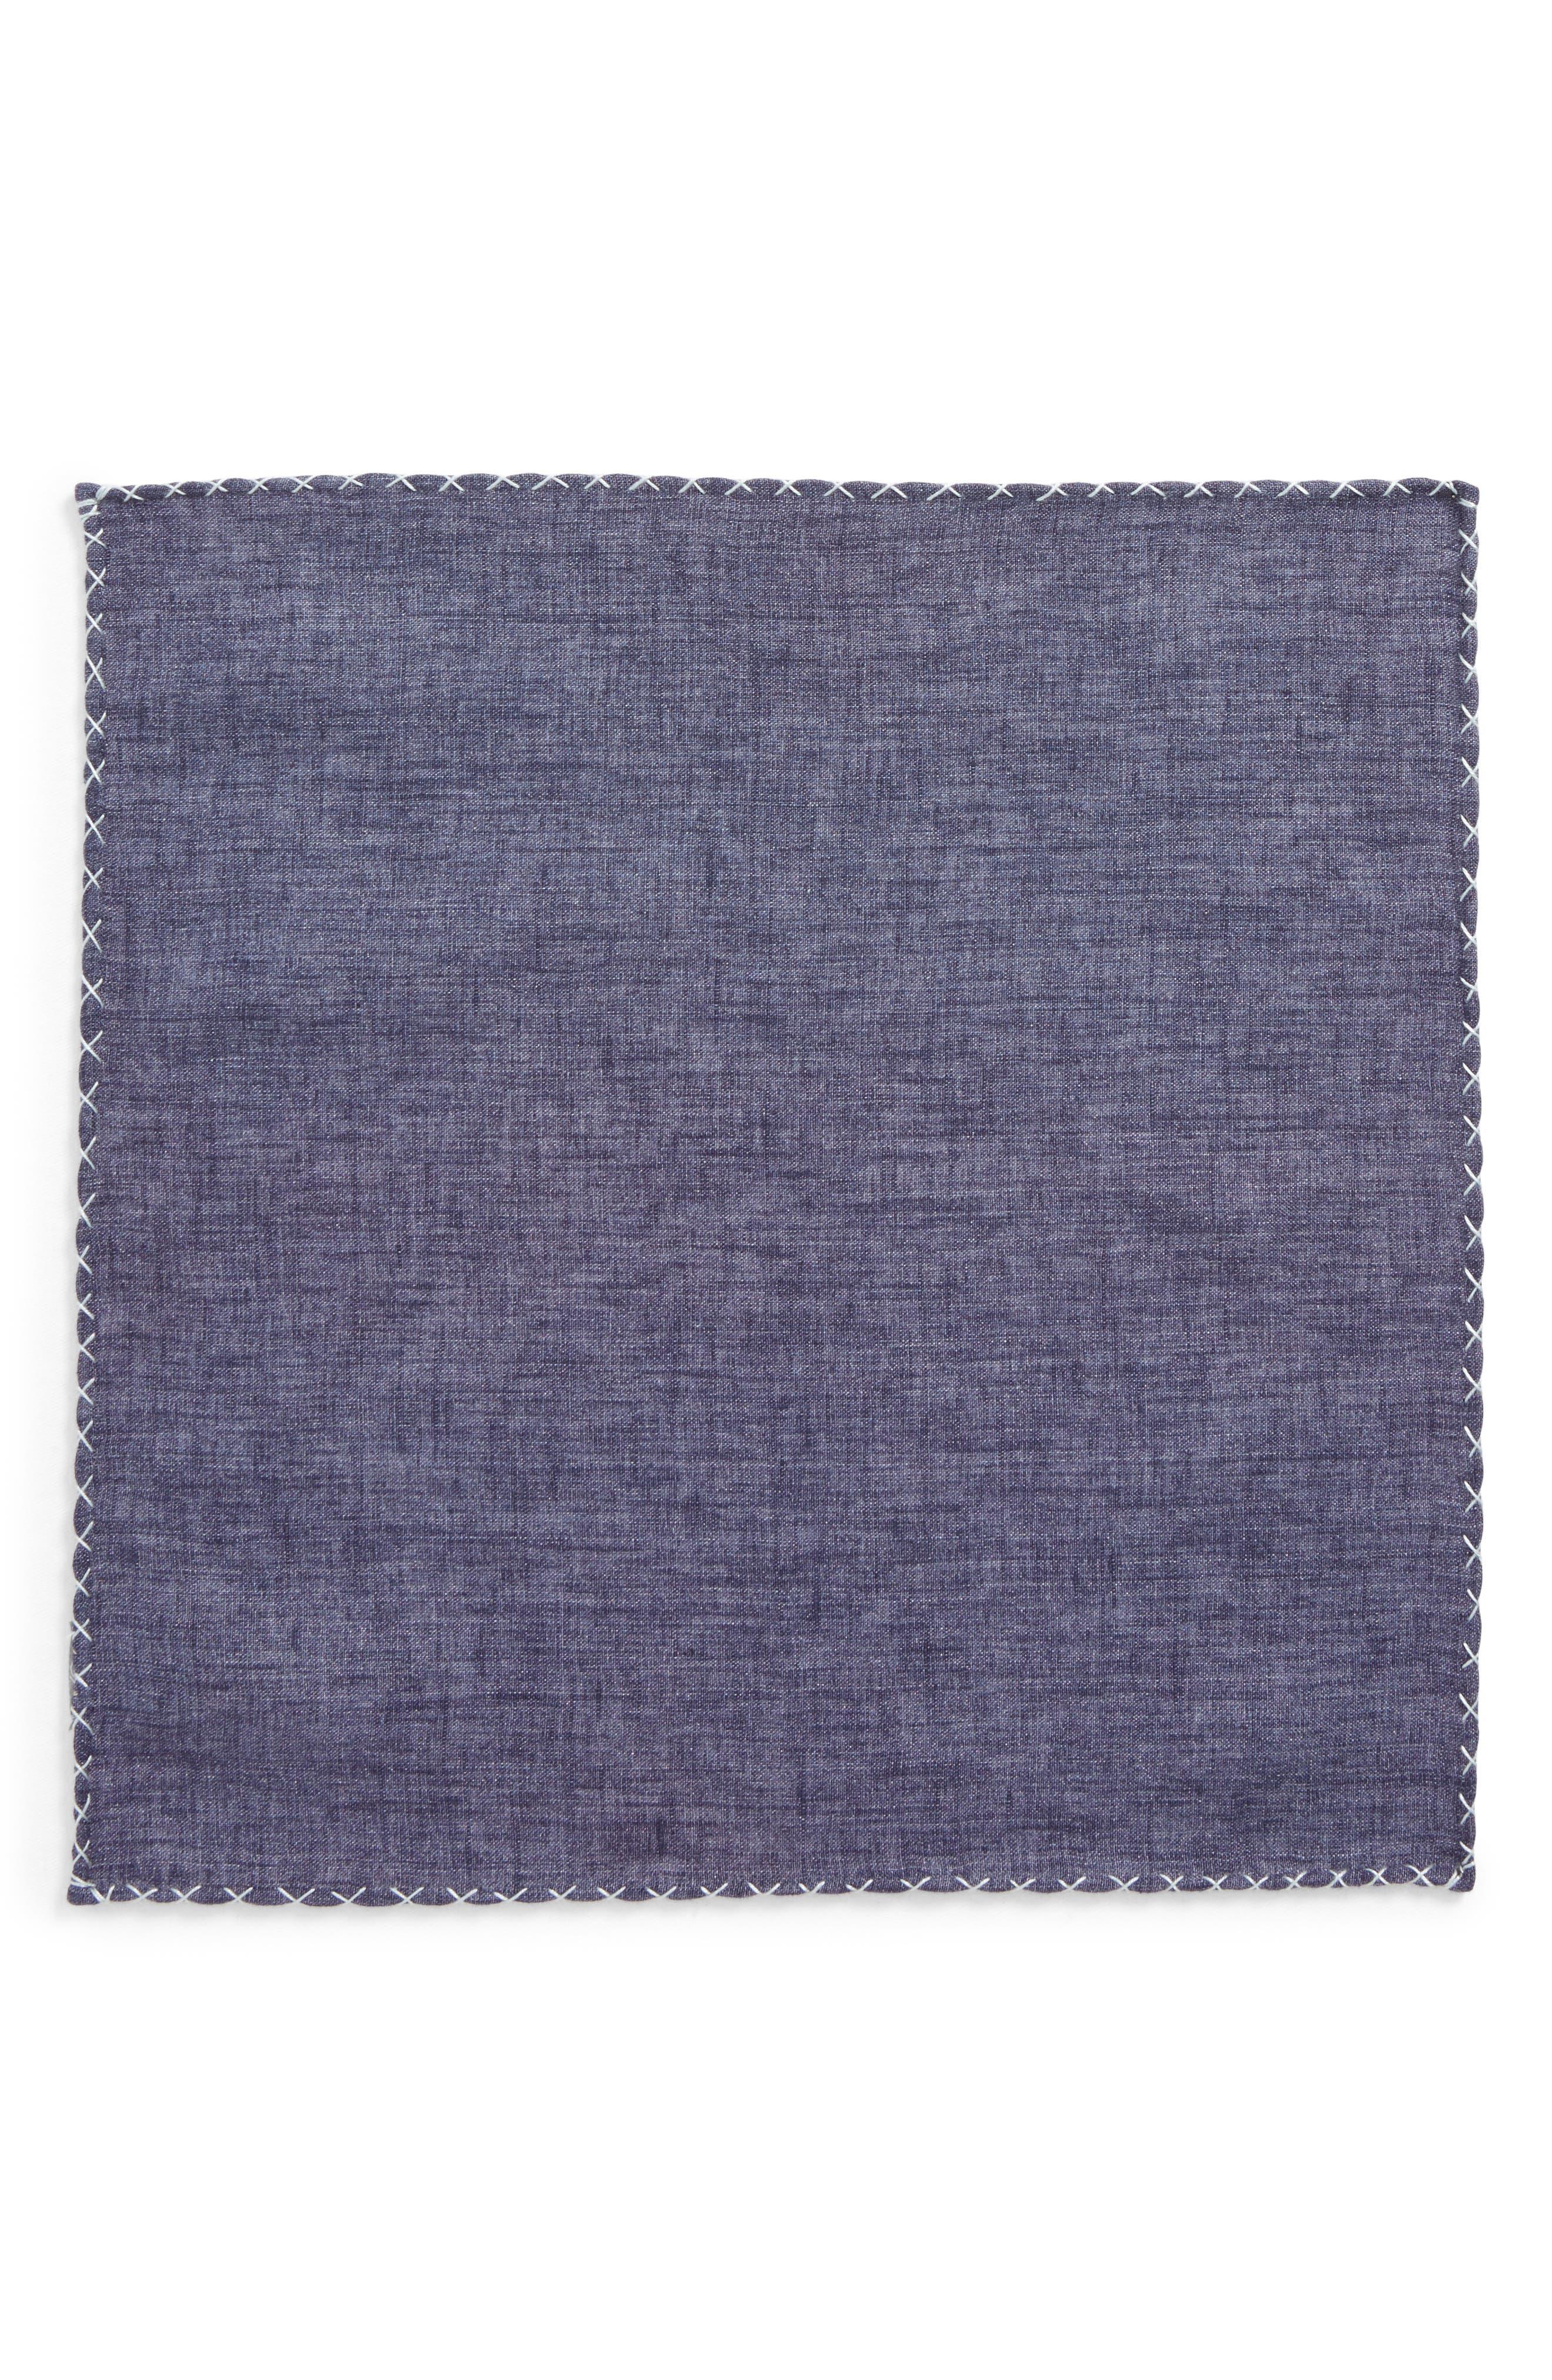 Solid Linen Pocket Square,                             Alternate thumbnail 2, color,                             020